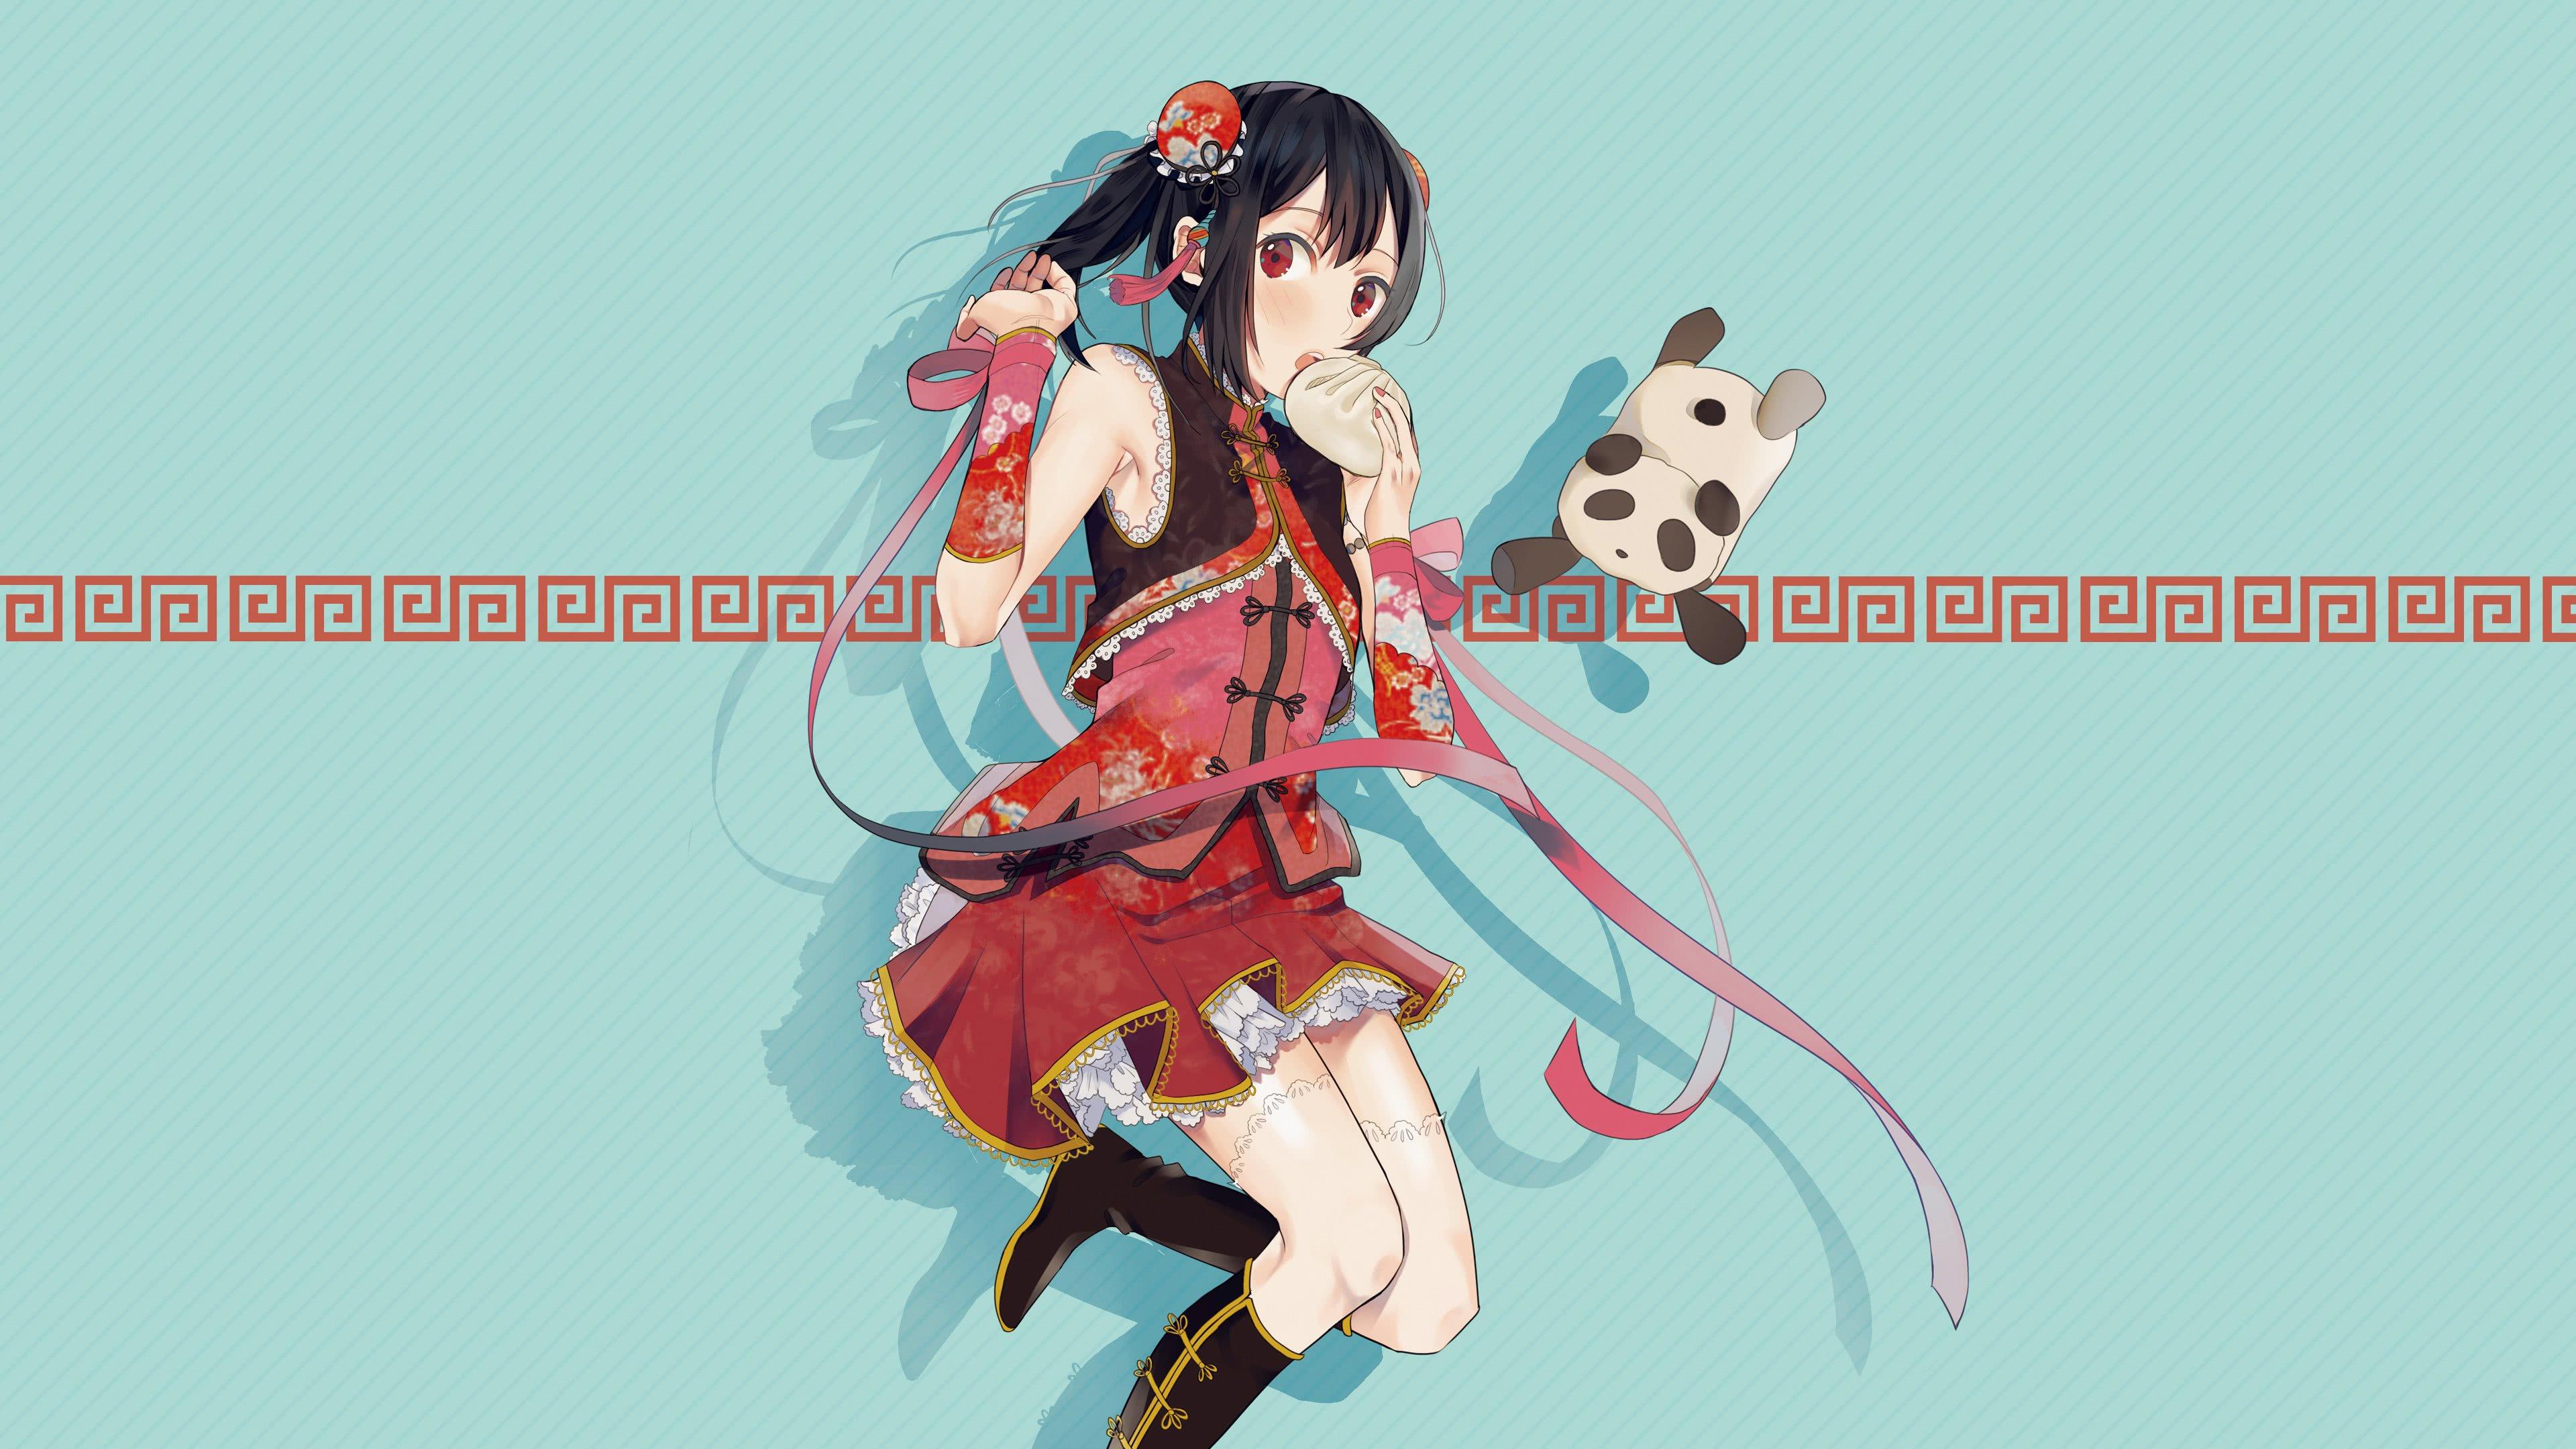 Kawaii Anime Girl UHD 4K Wallpaper | Pixelz